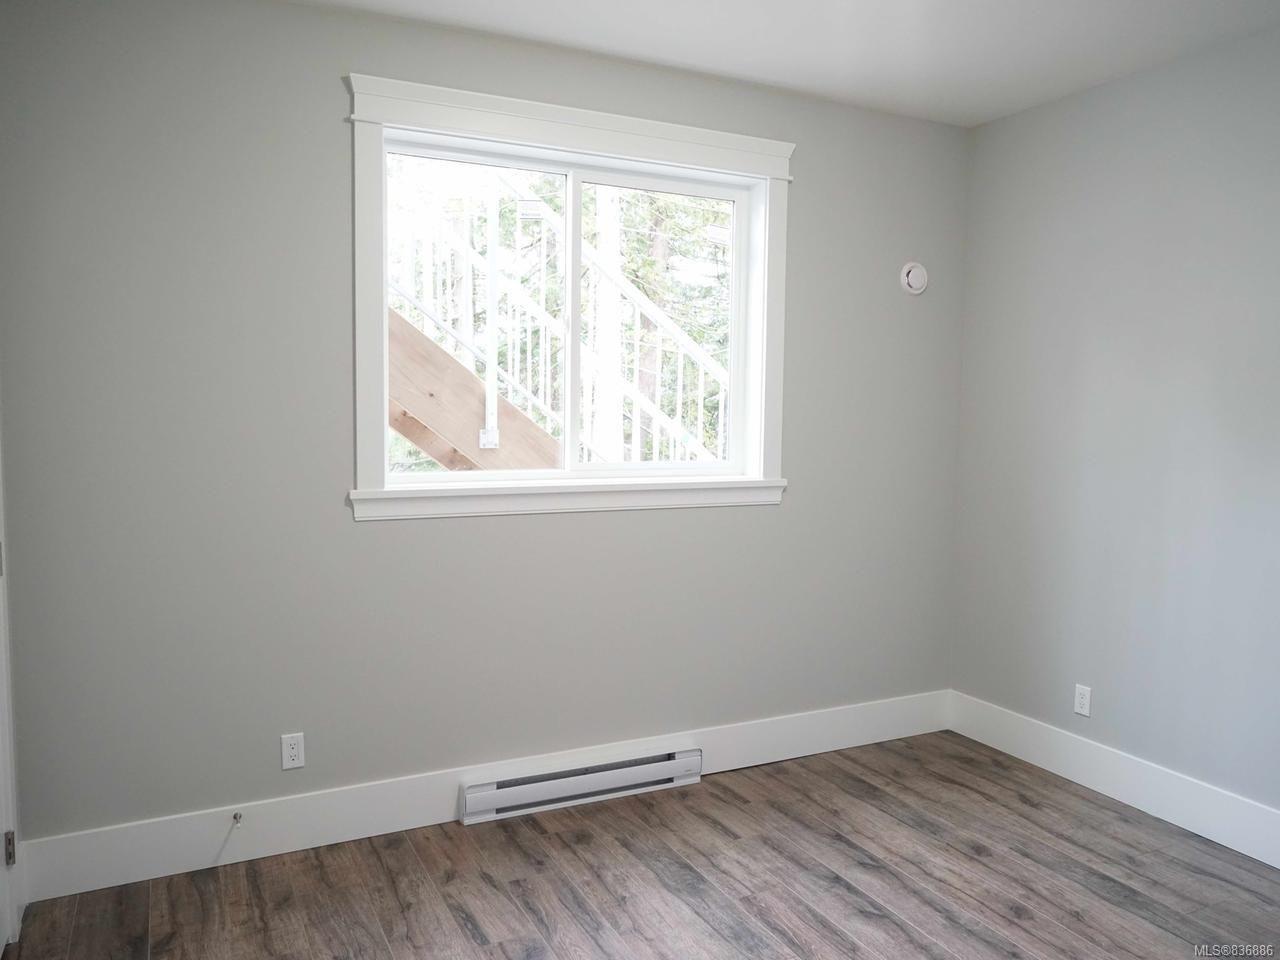 Photo 17: Photos: 123 Lindquist Rd in NANAIMO: Na North Nanaimo House for sale (Nanaimo)  : MLS®# 836886